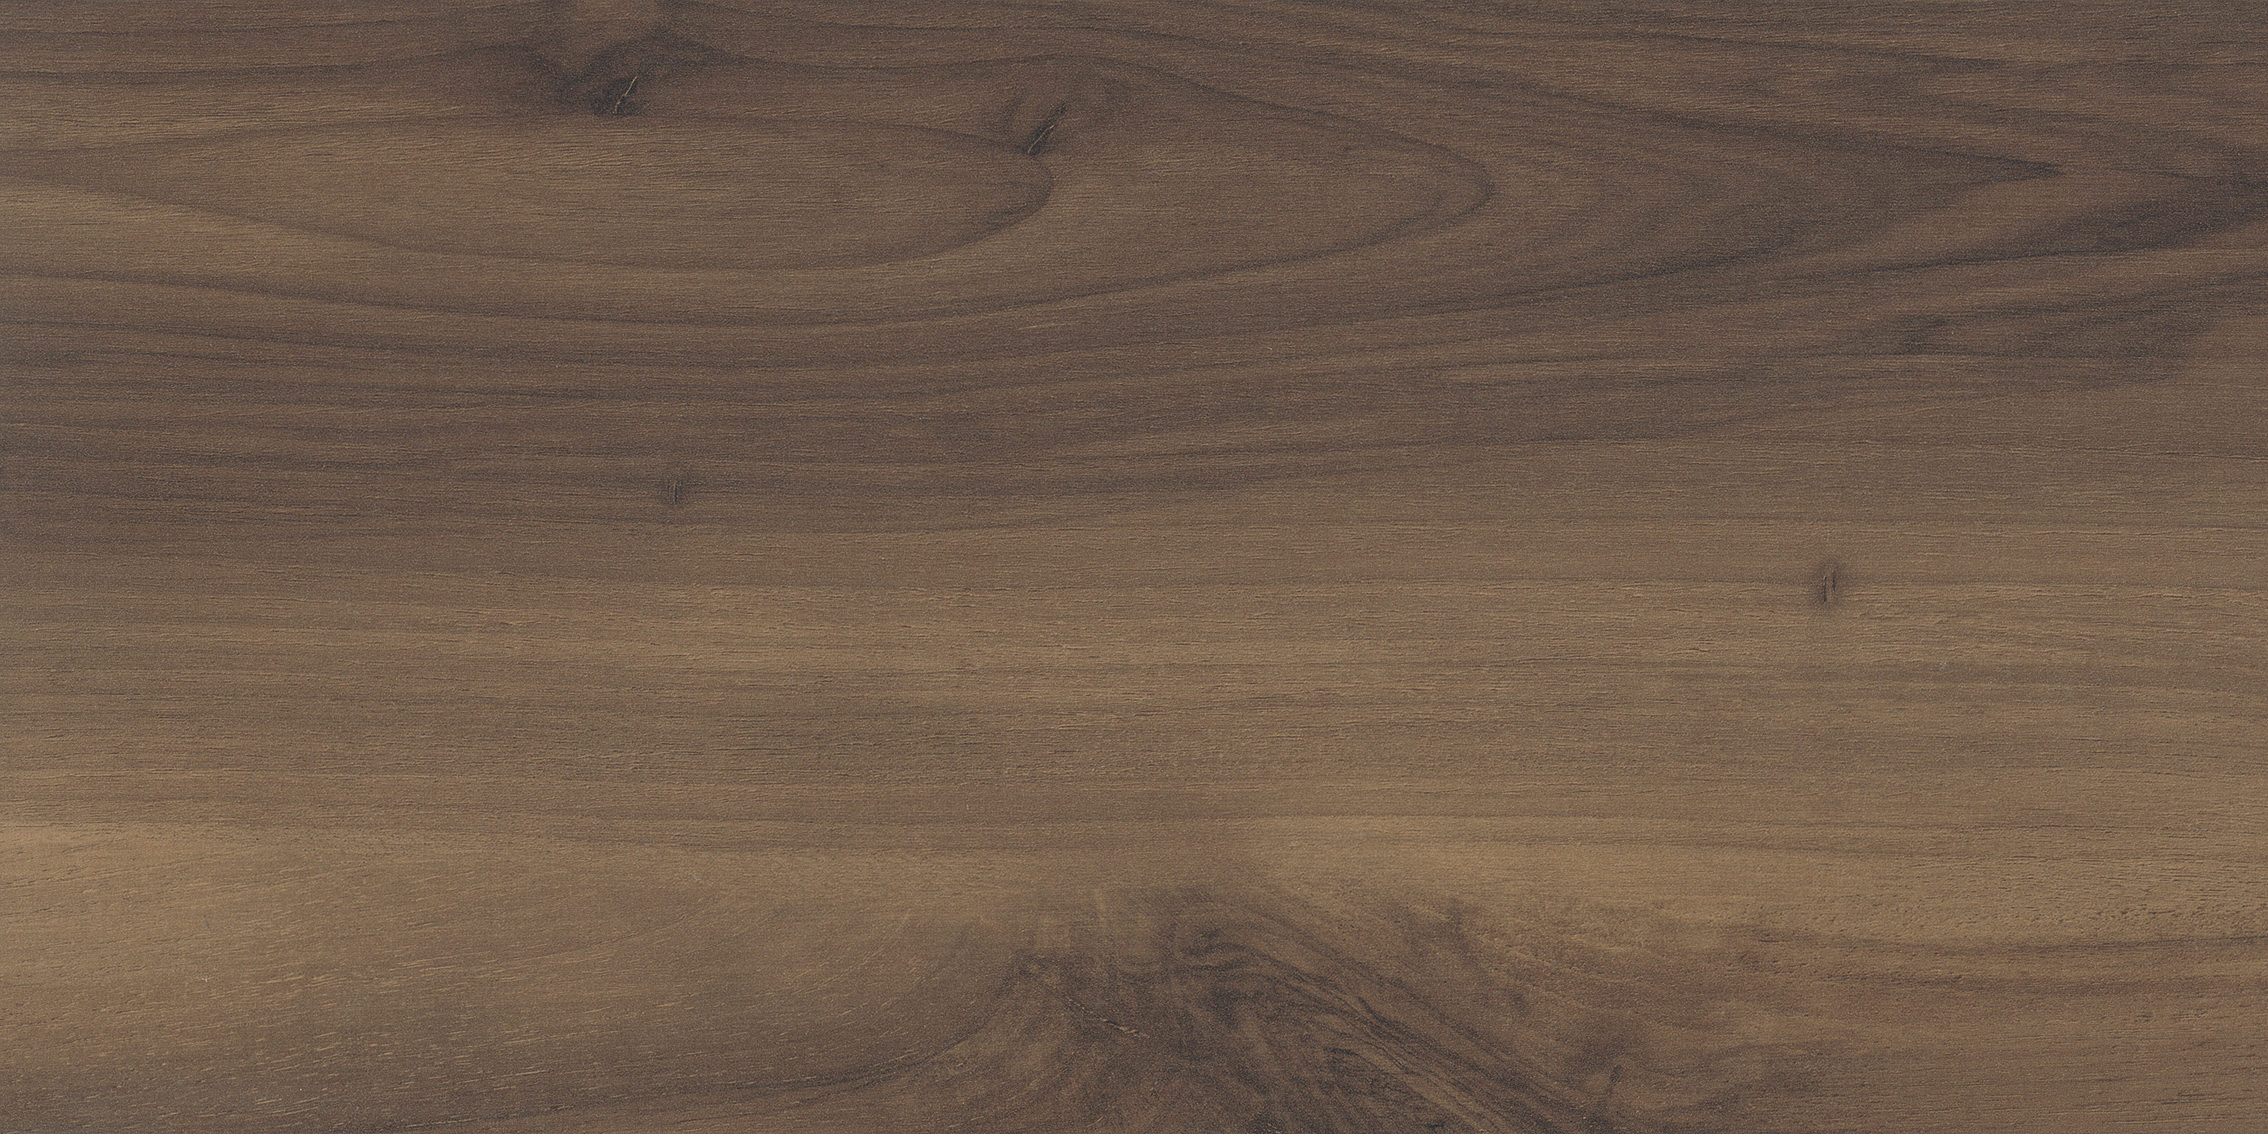 535859 haro laminat tritty 100 campus 4v nussbaum romano matt inkl silent pro trittschalld mmung. Black Bedroom Furniture Sets. Home Design Ideas